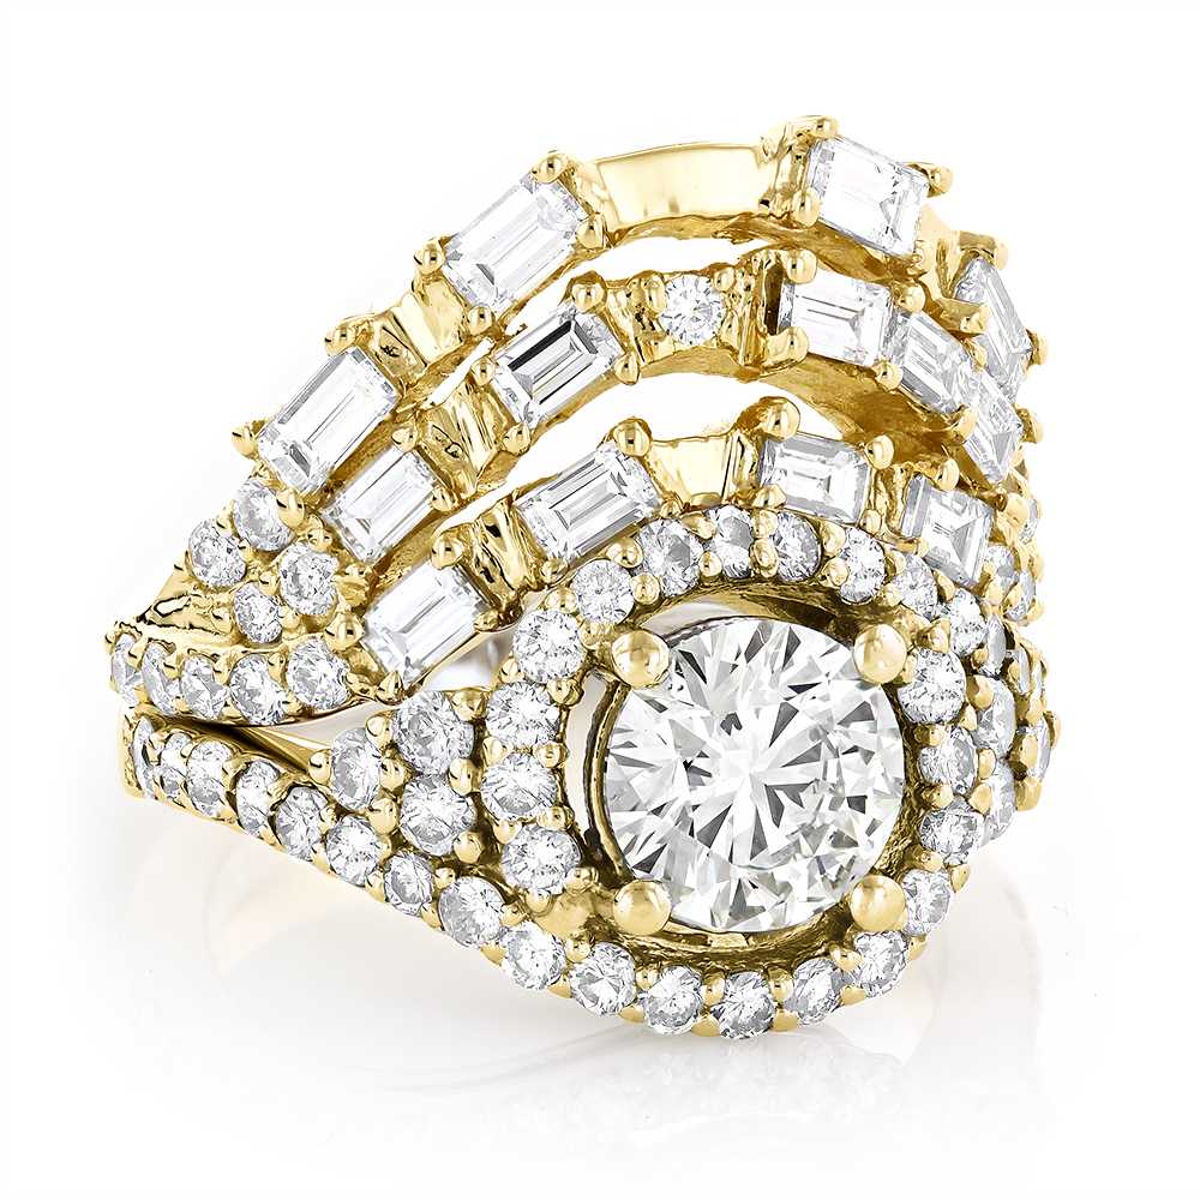 Designer Halo Diamond Engagement Ring Set 3ct 14K Gold Trigram I Ching